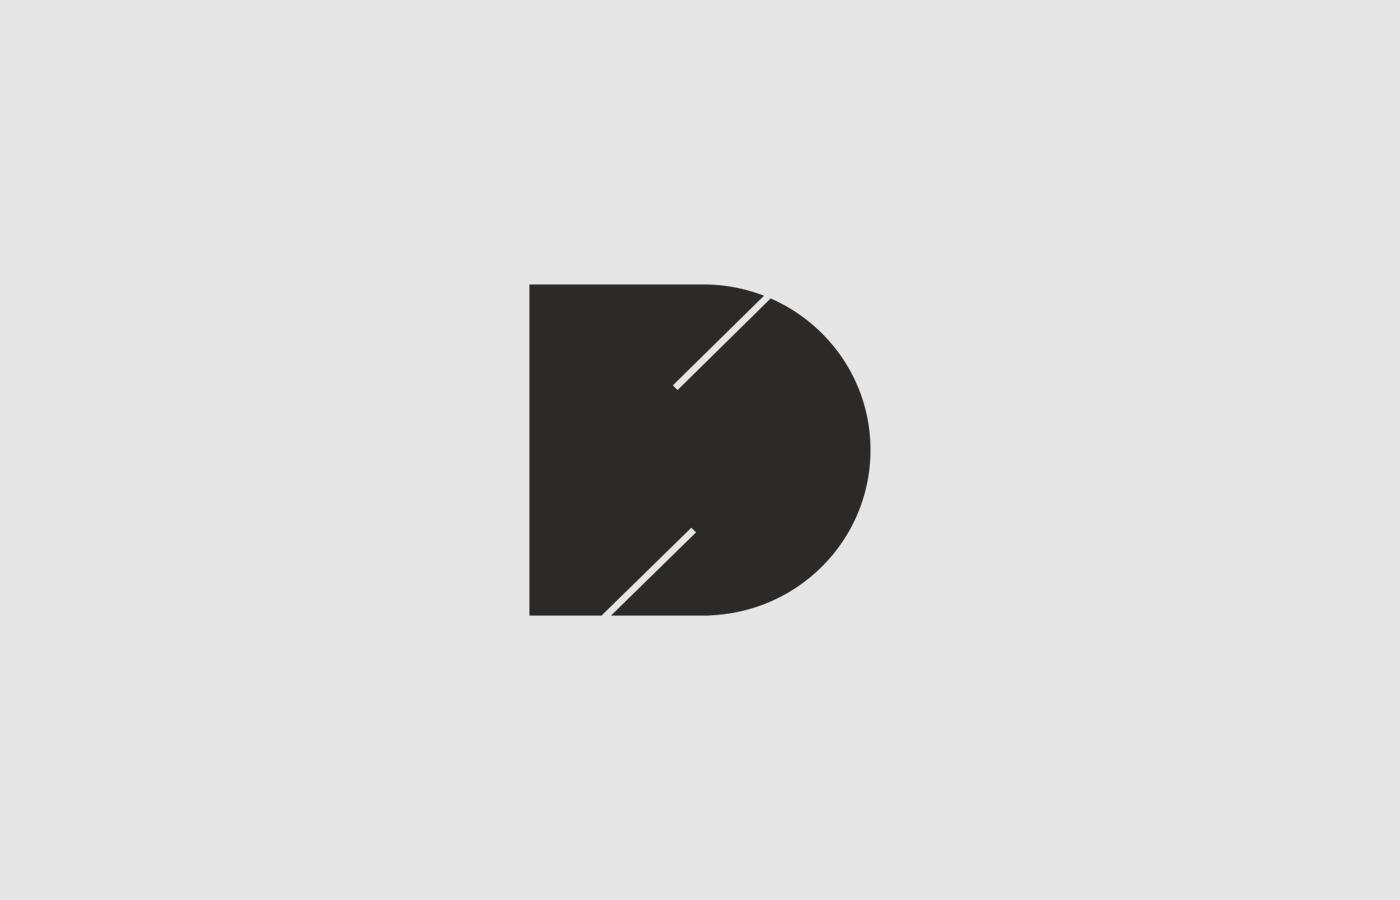 logo-design-daniel-schuh personal brand